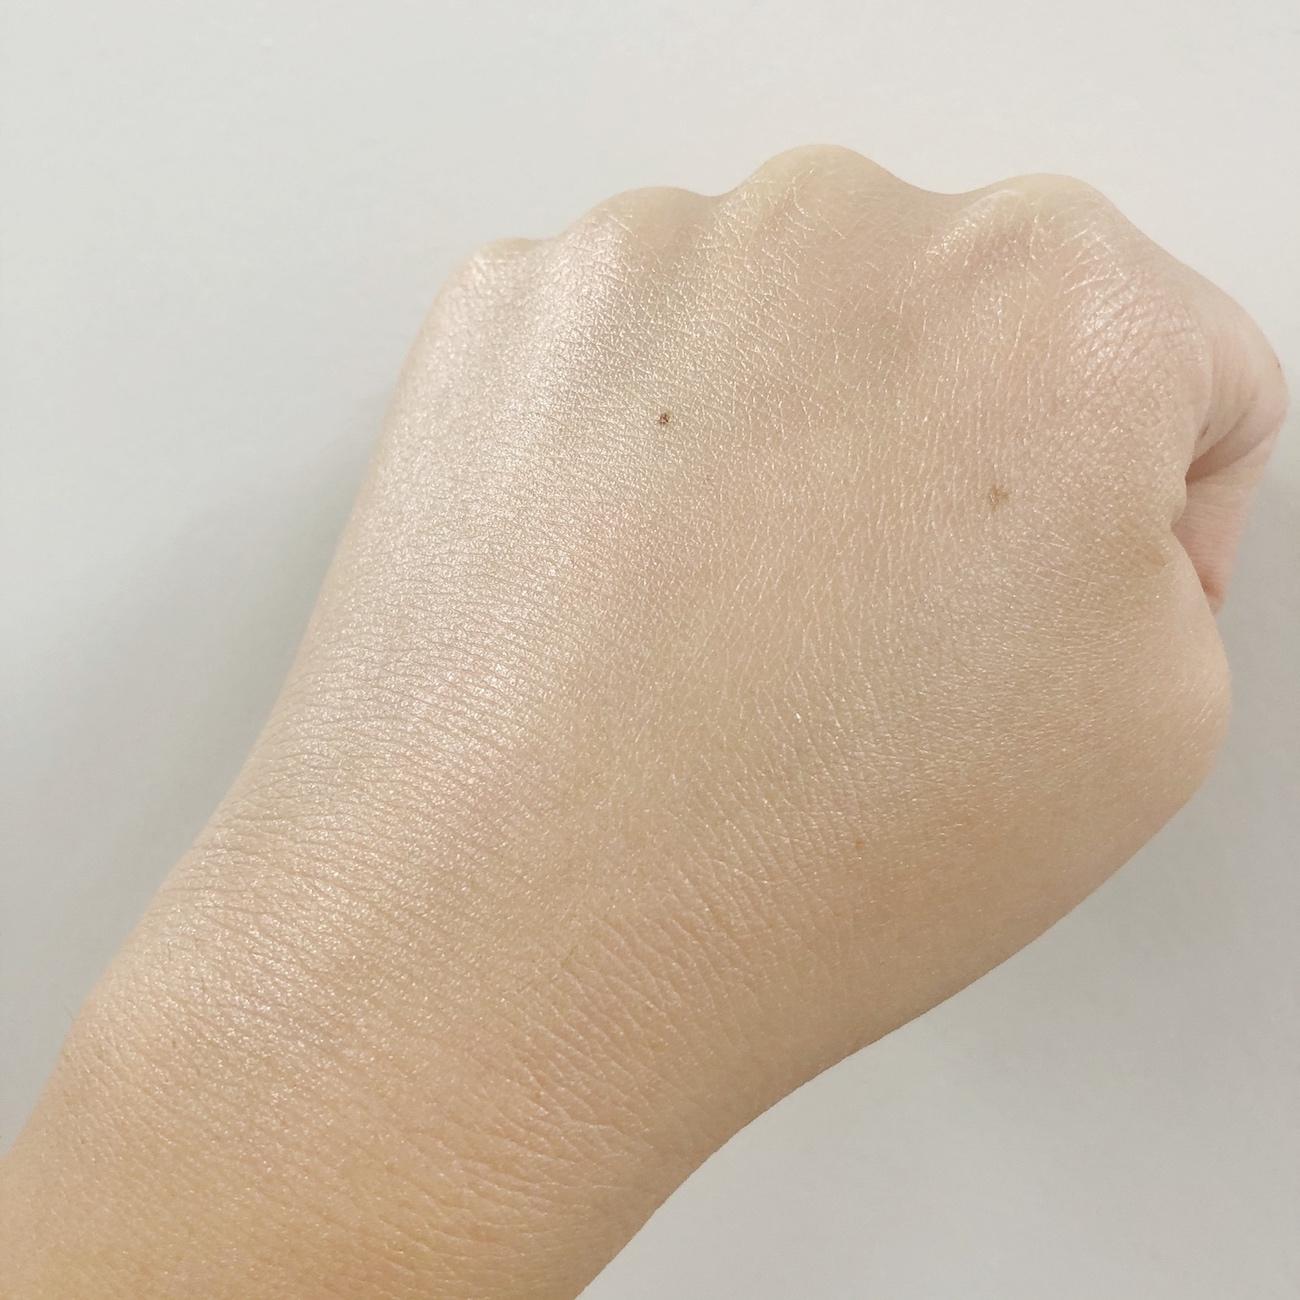 M・A・C ストロボクリーム ピンクライト 保湿しながらツヤ肌を叶えるベストセラー化粧下地に関する画像6